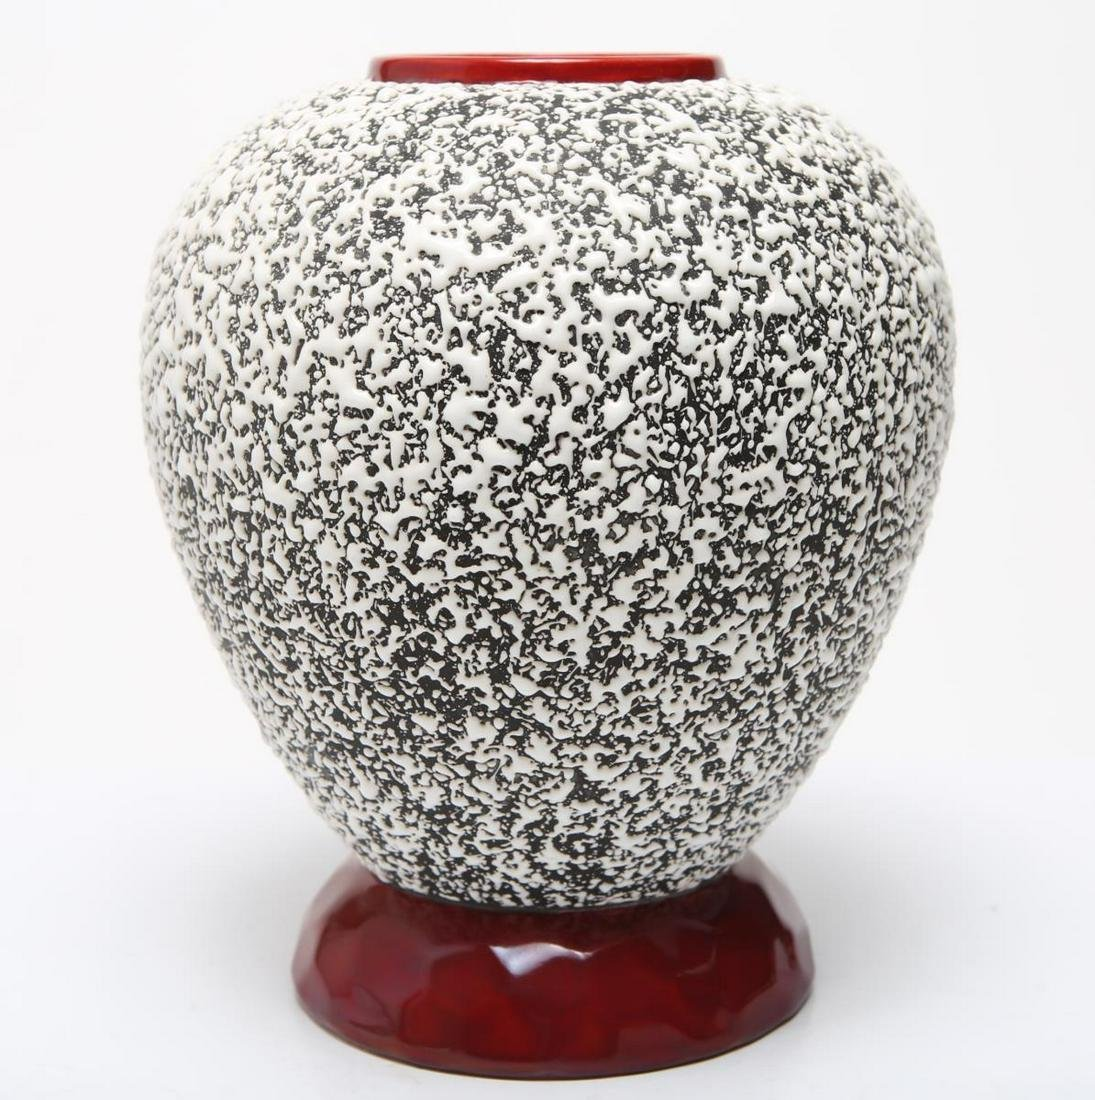 Art Deco Sevres Ceramic Vase by Paul Milet, 1930s